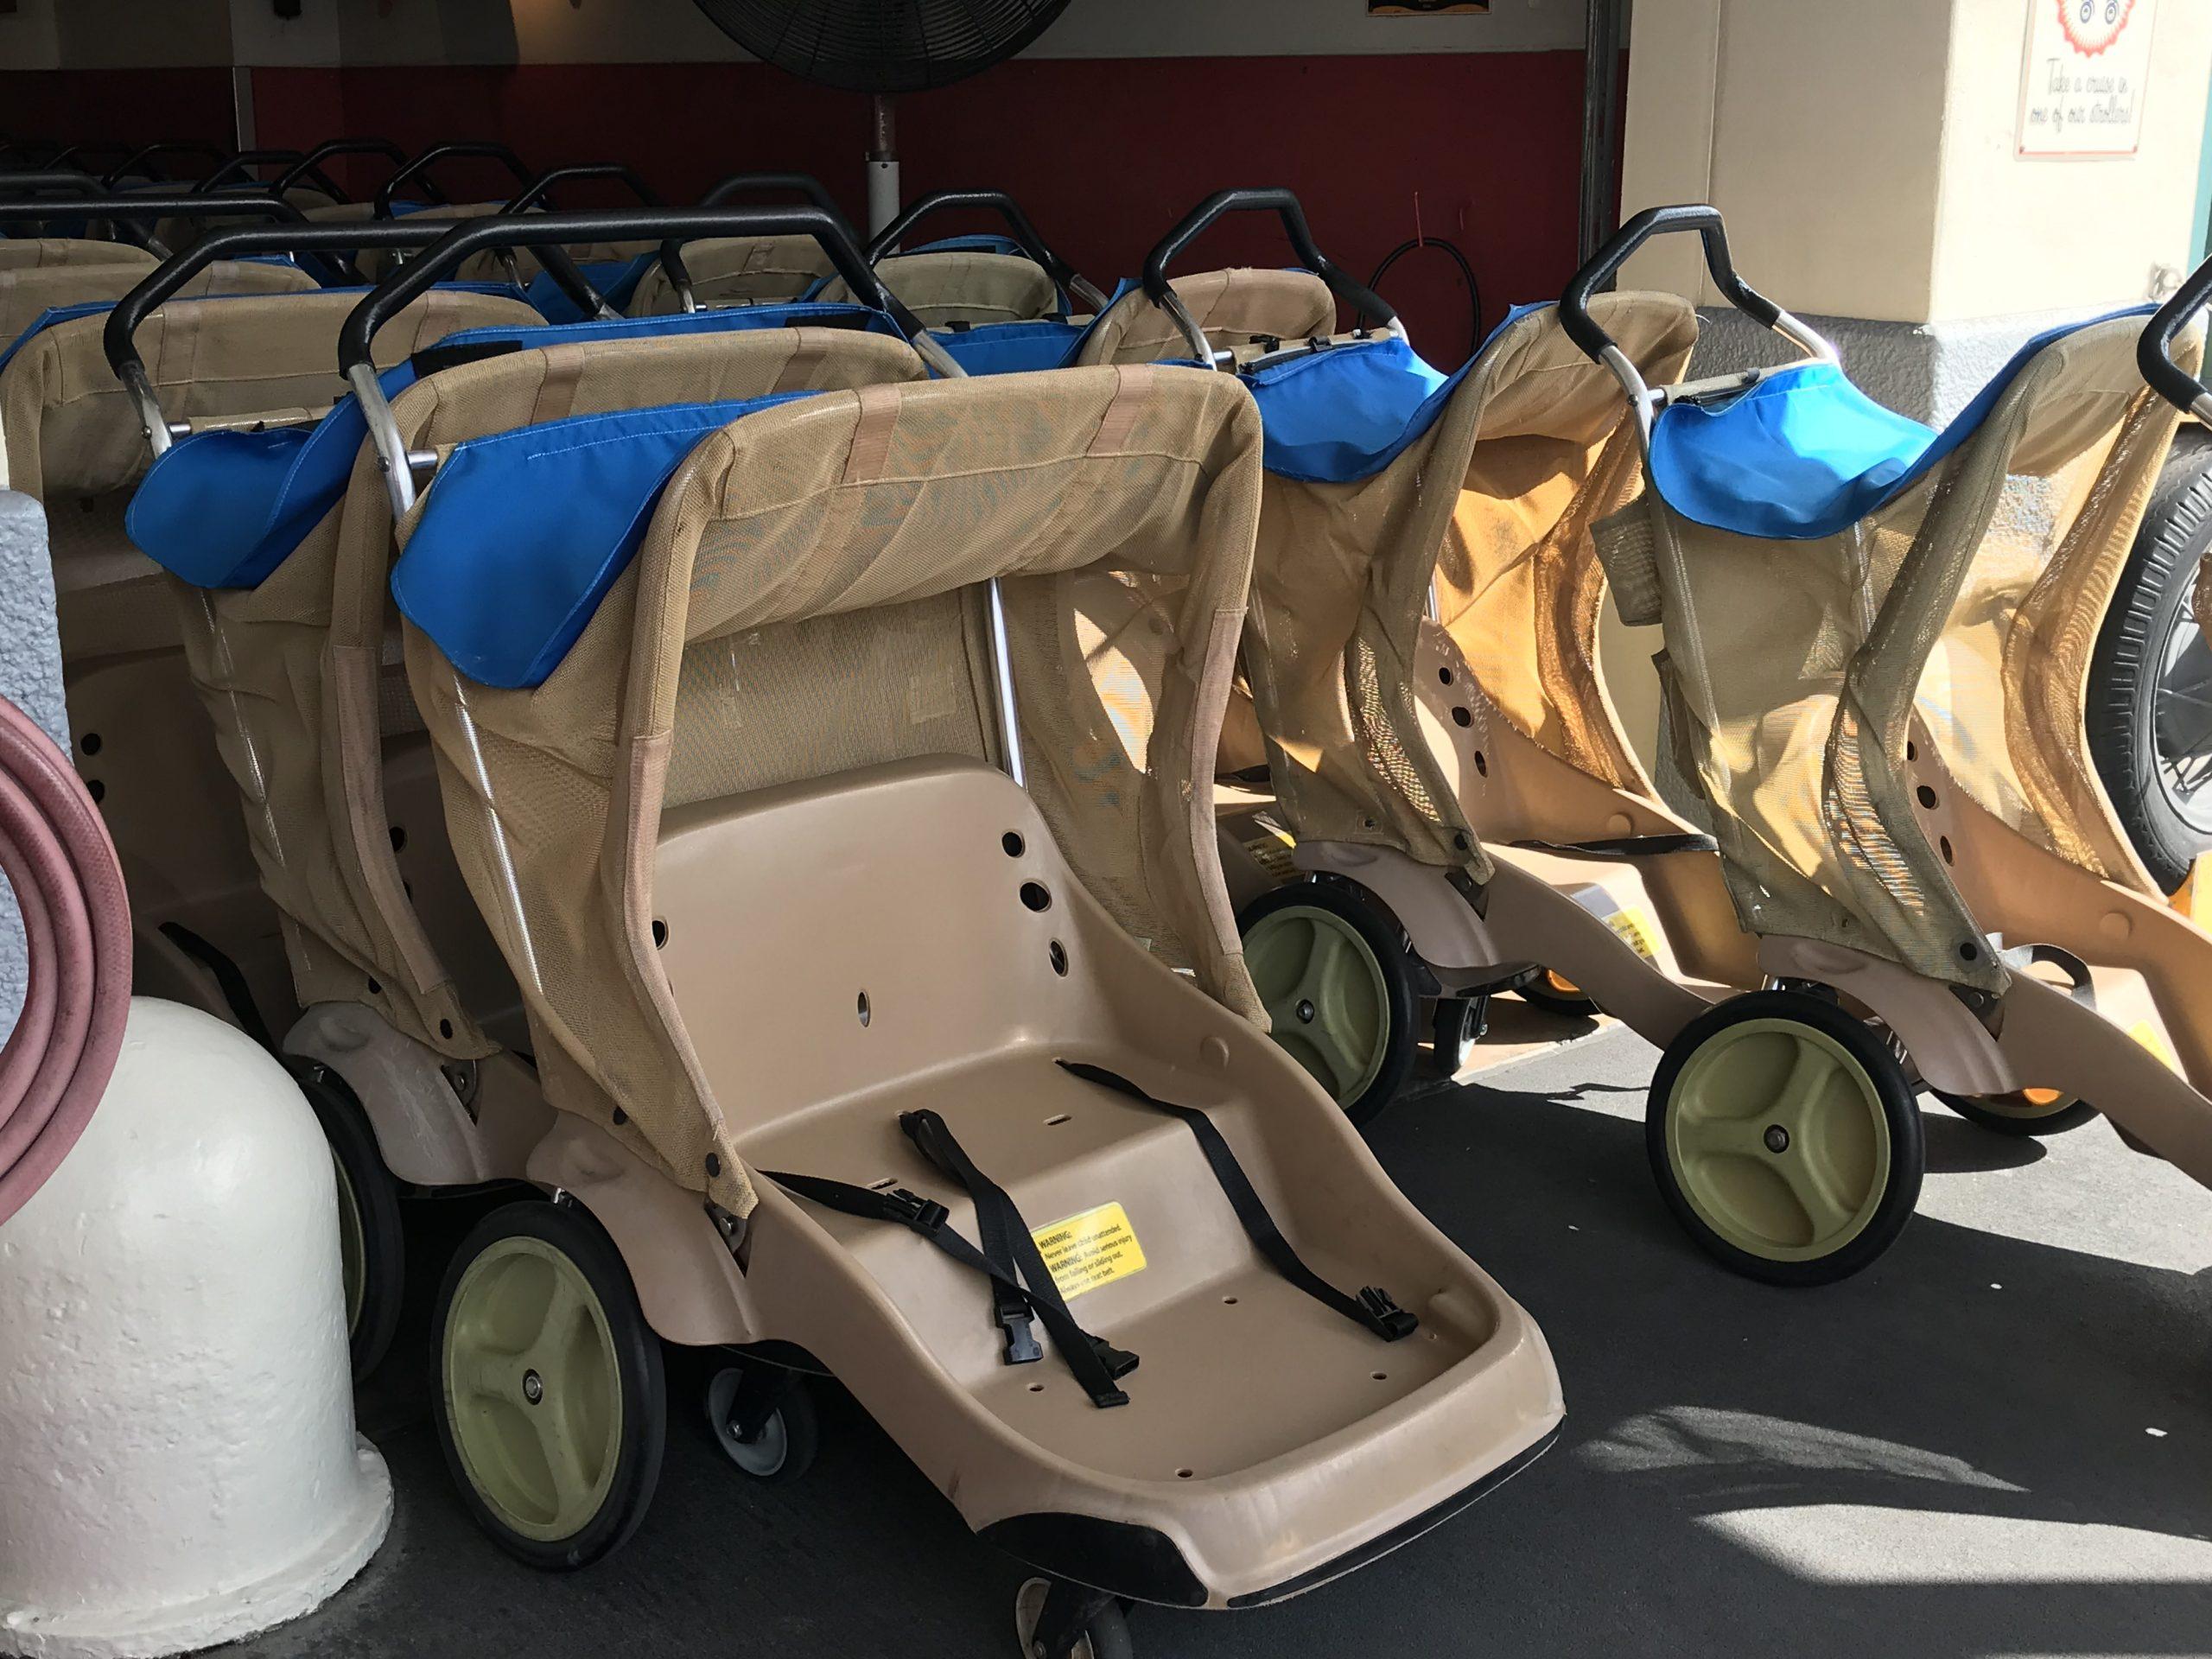 Rental Strollers at Walt Disney World